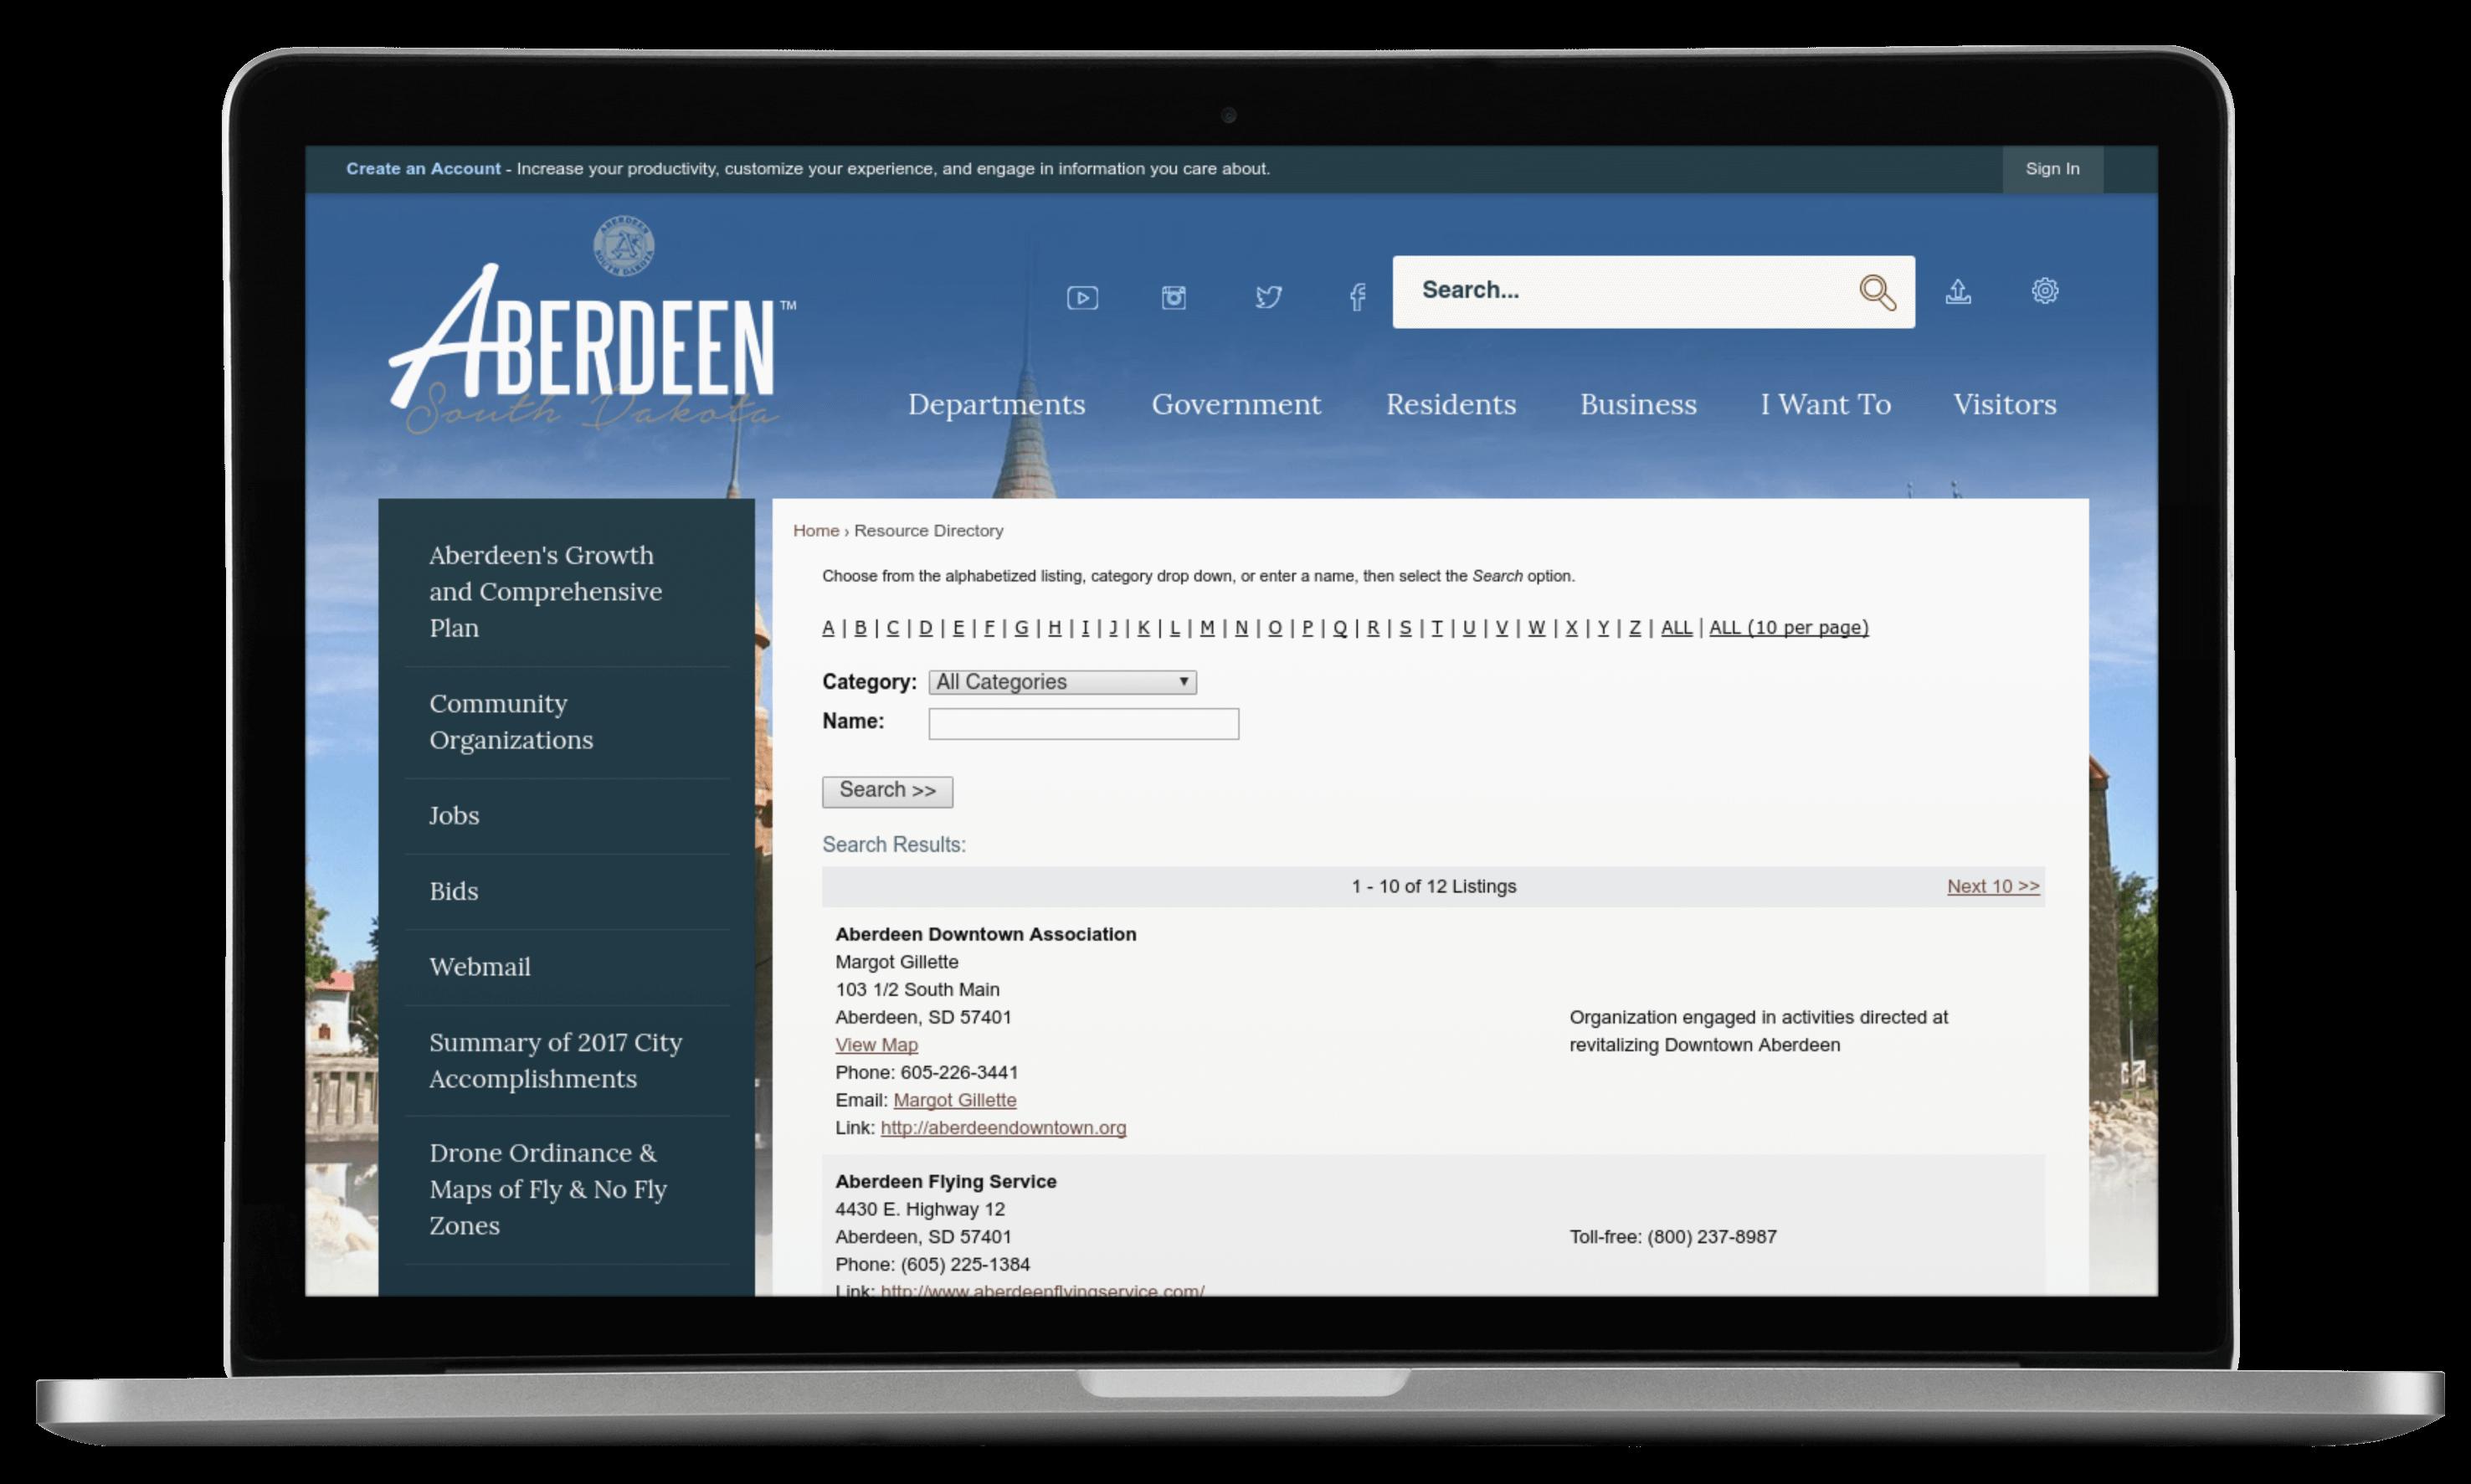 Website_Redesigns_can_foster_local_Business_Aberdeen